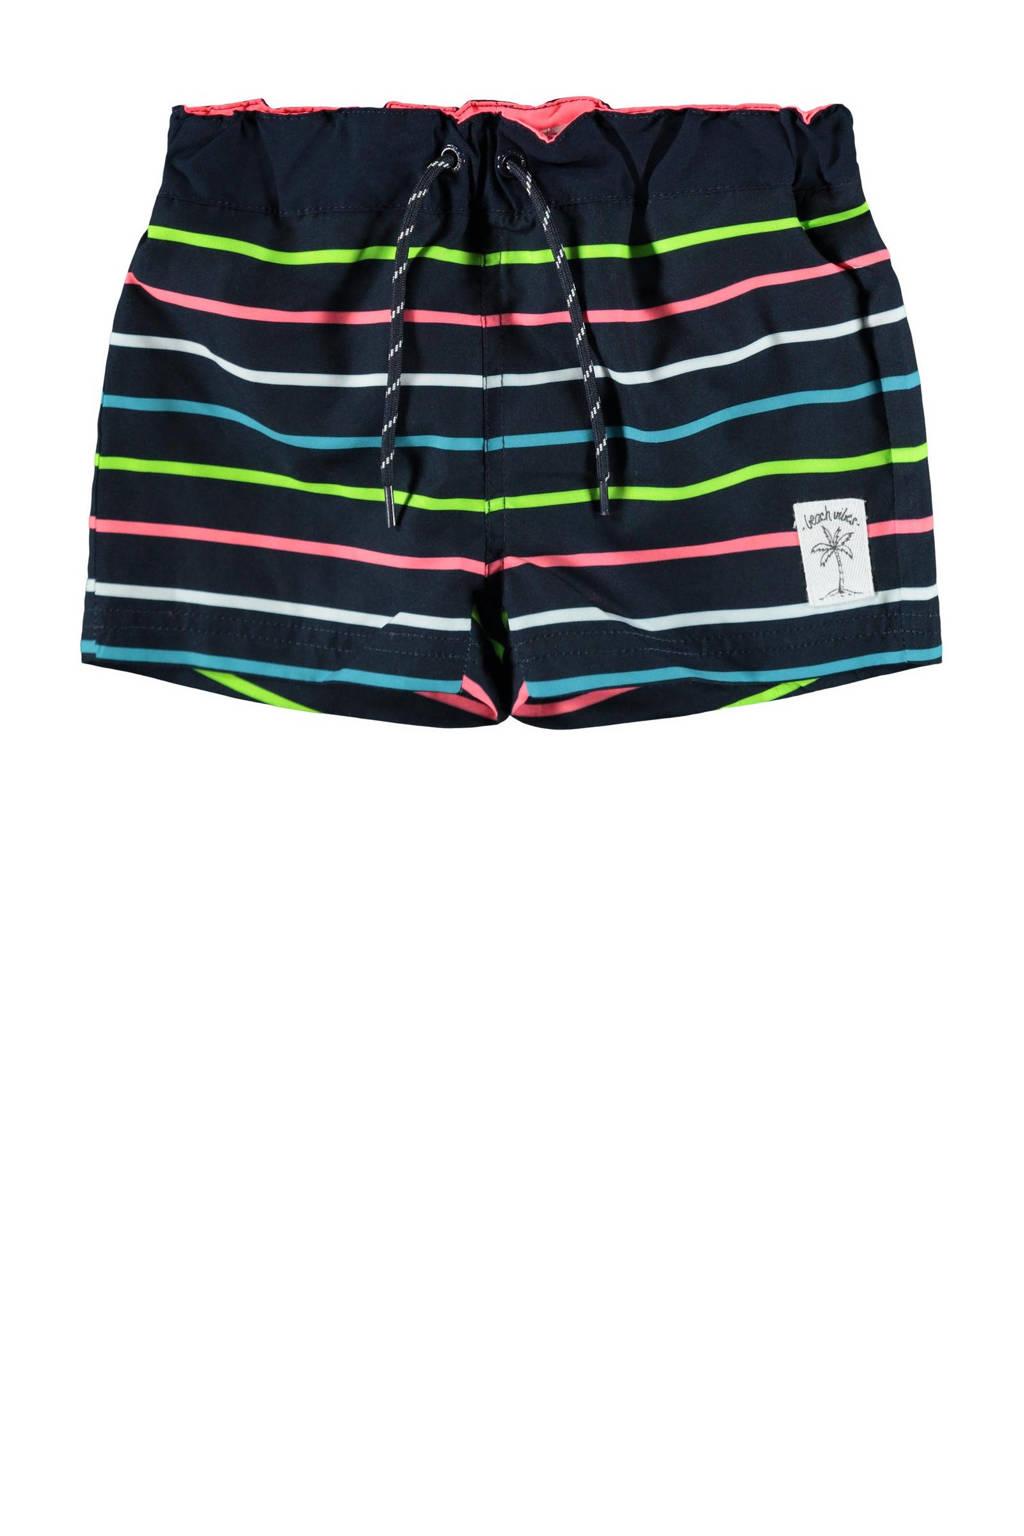 NAME IT MINI gestreepte zwemshort Zimbal donkerblauw/neon, Donkerblauw/neon